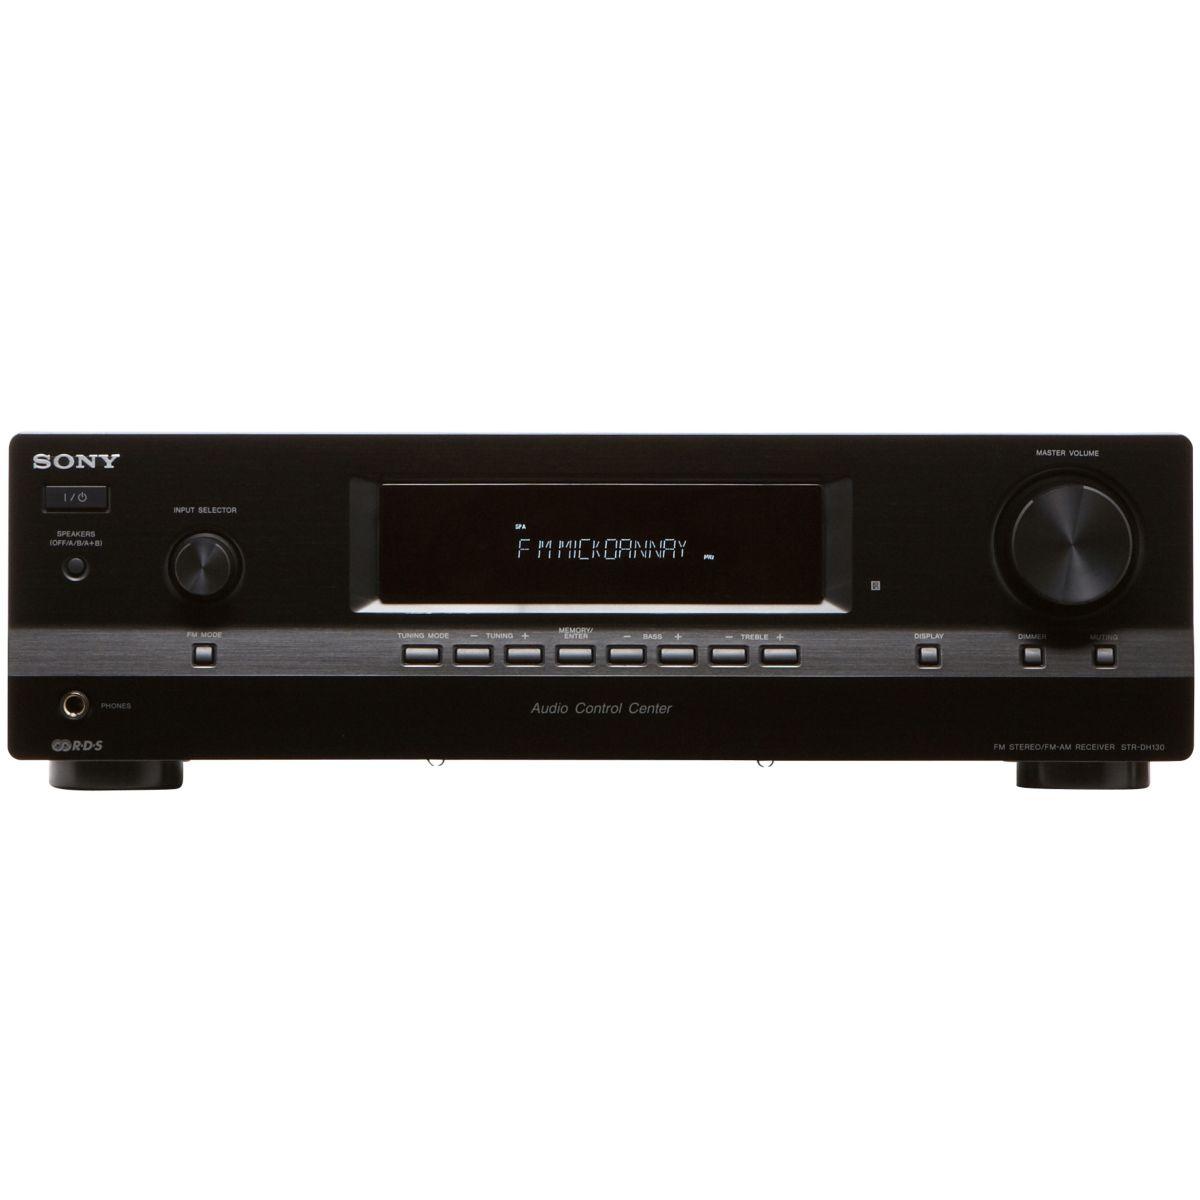 Amplificateur Hi-Fi 2x200W SONY STRDH130